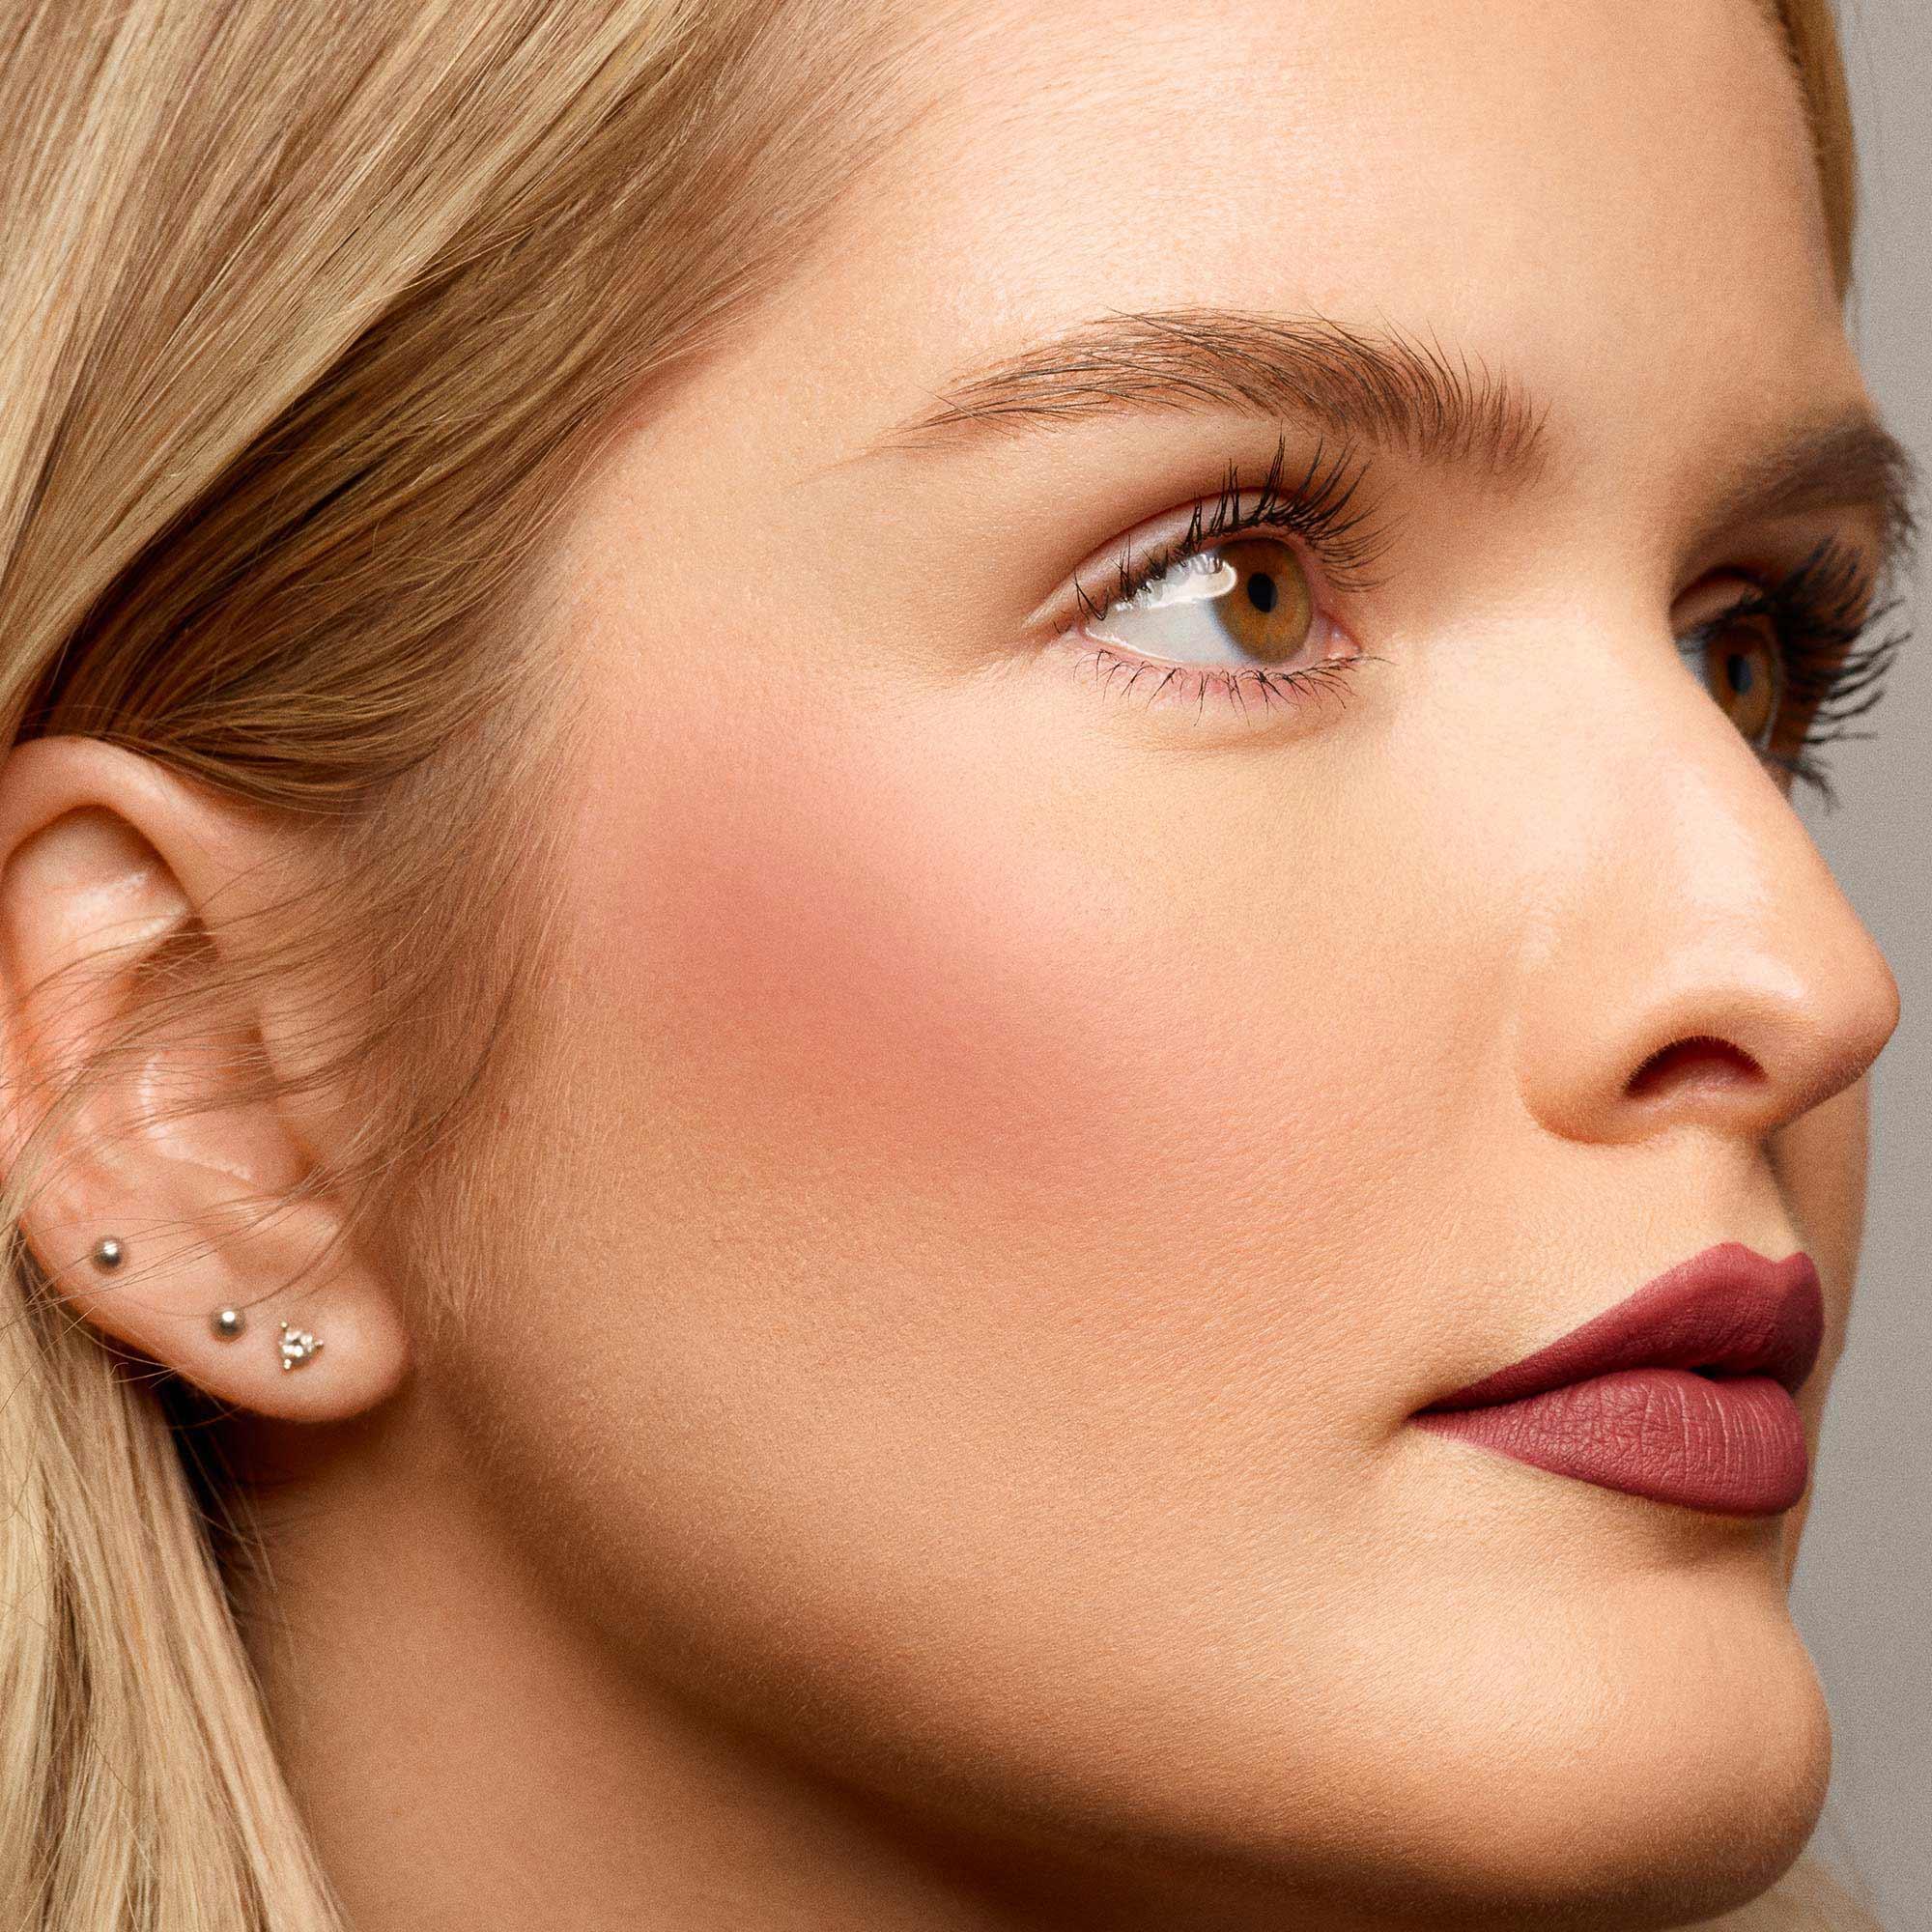 KVD Beauty Everlasting Blush, snapdragon